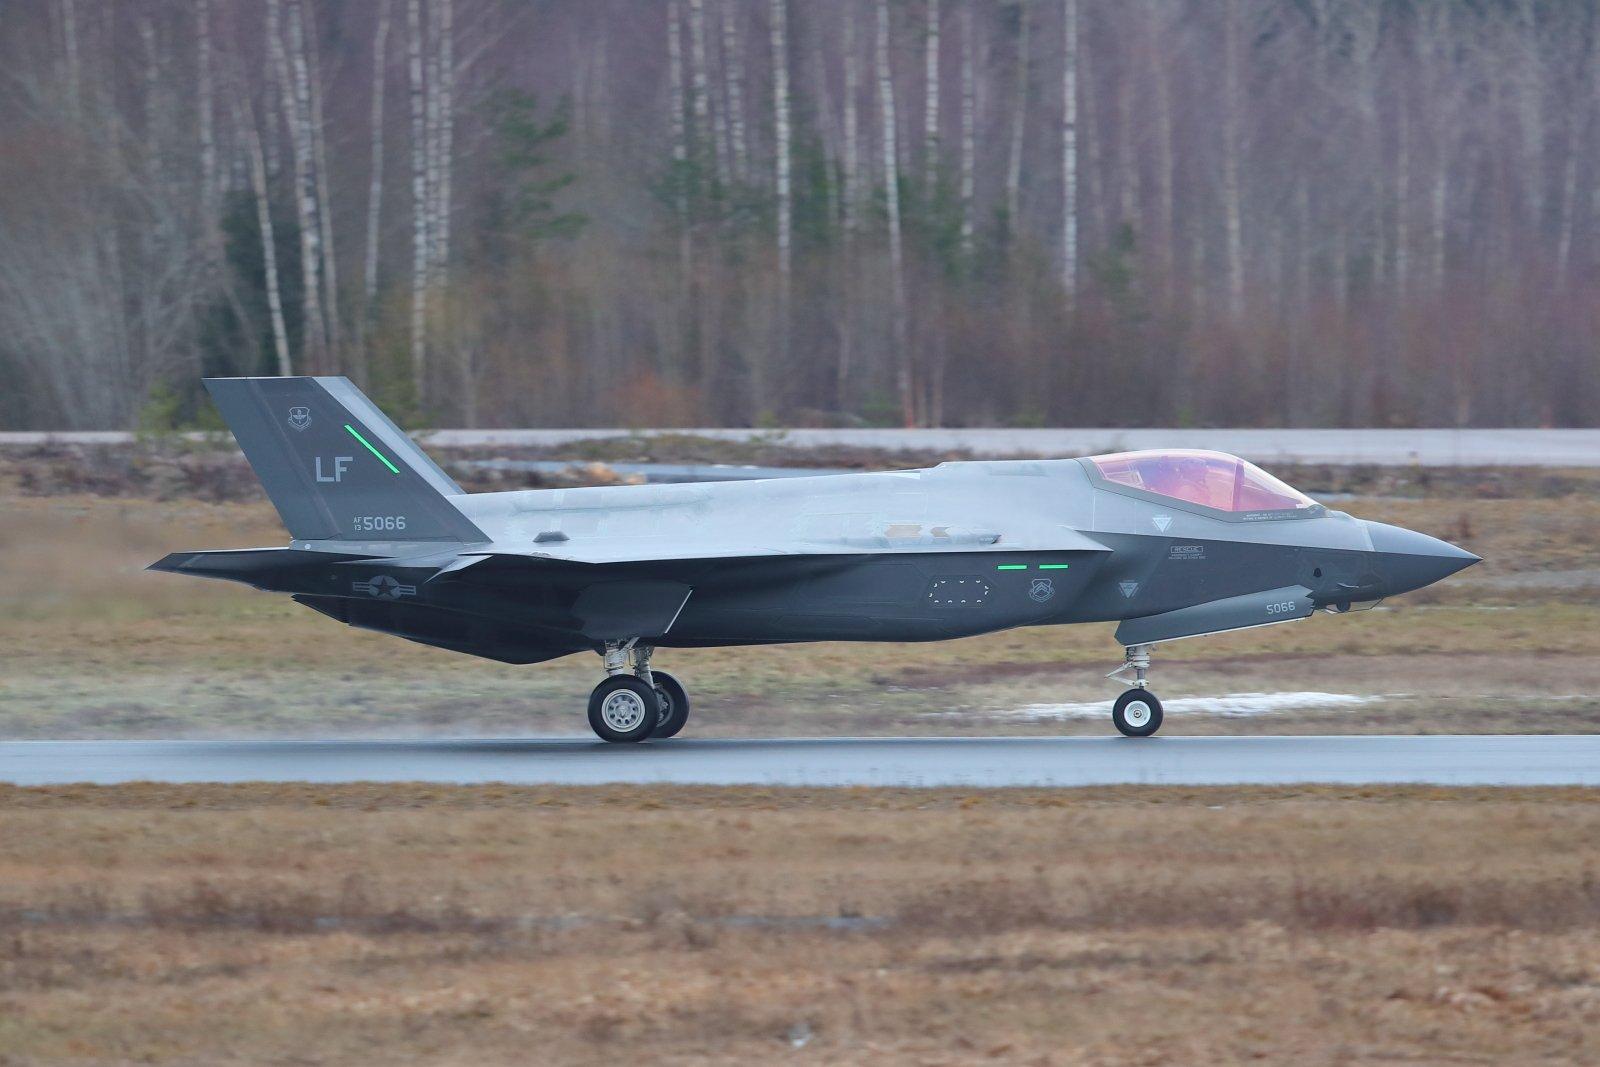 Lockheed Martin F-35A Lightning II 13-5066 EFTP 2020 02 12